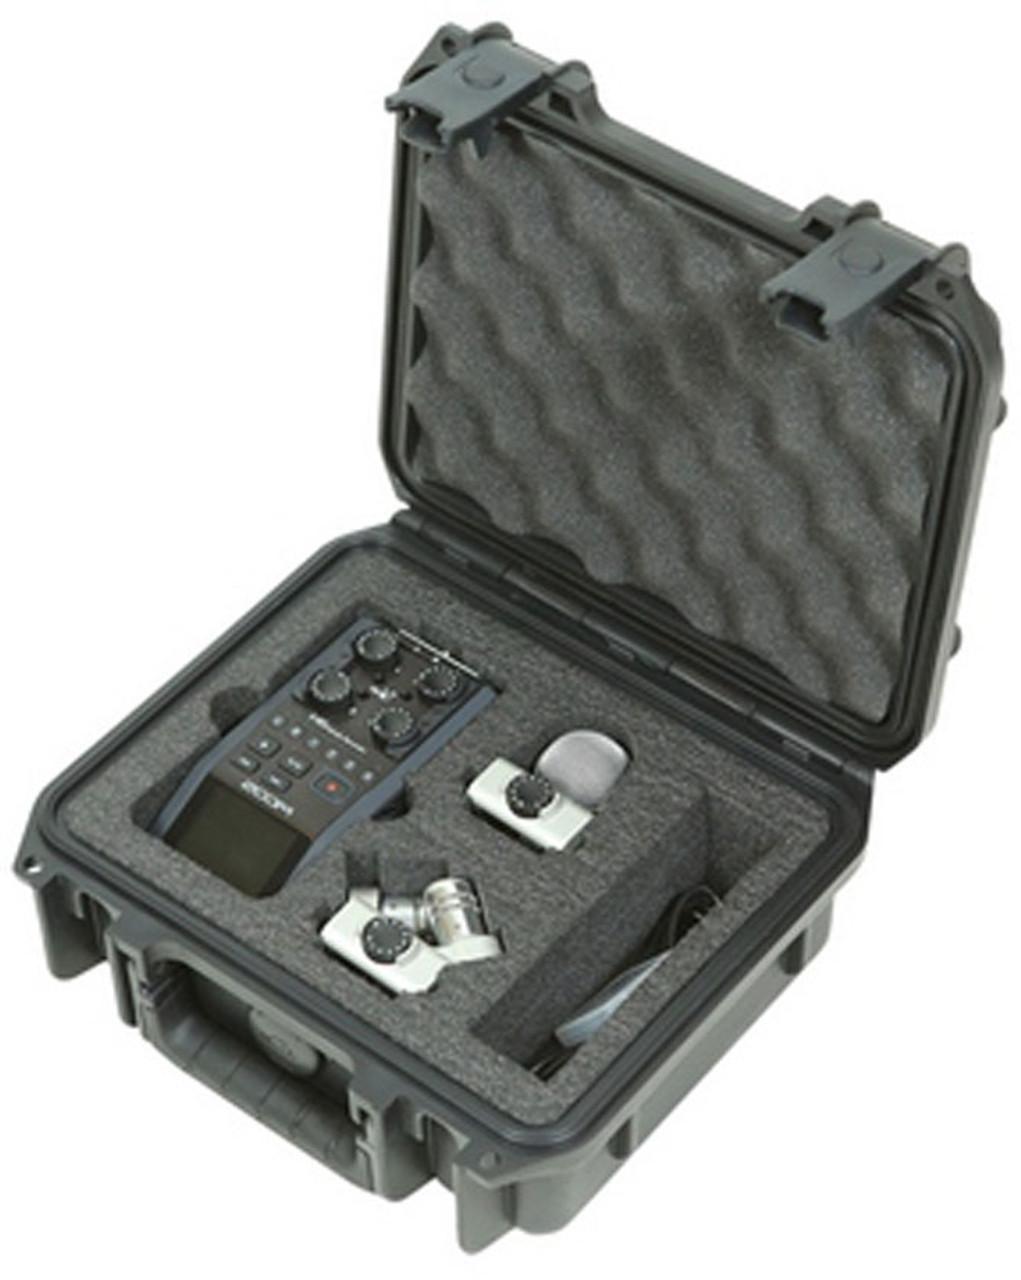 Skb 3i 0907 4 H6 Case For Zoom H6 Handy Recorder Proaudio Com